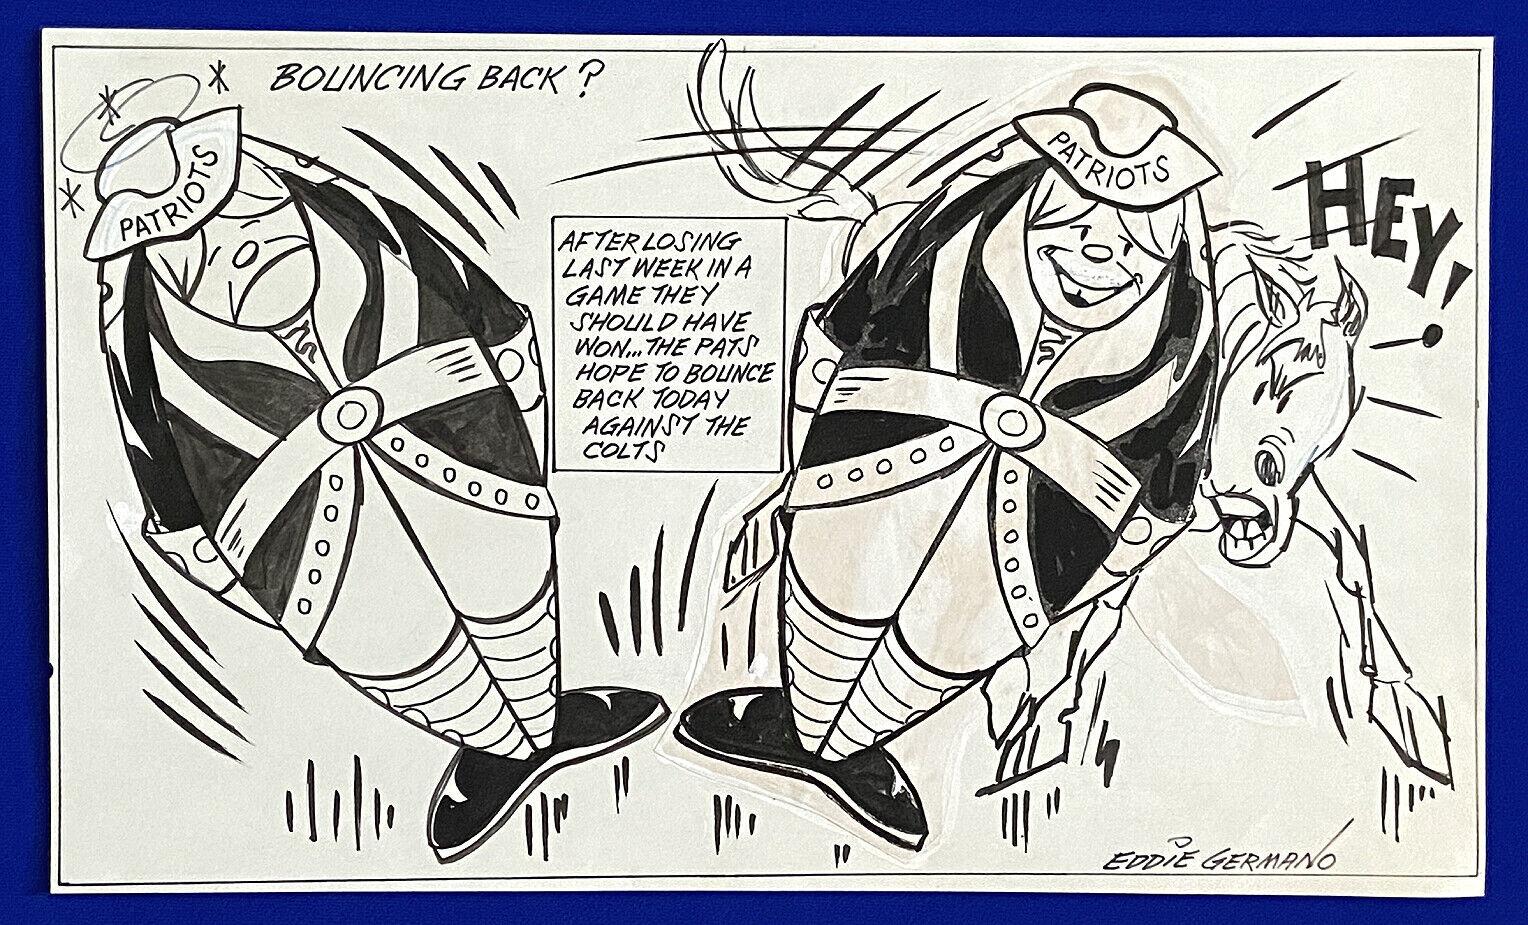 "1970's patriots vs. colts ""bouncing back?"" 11x18 original cartoon art by germano"